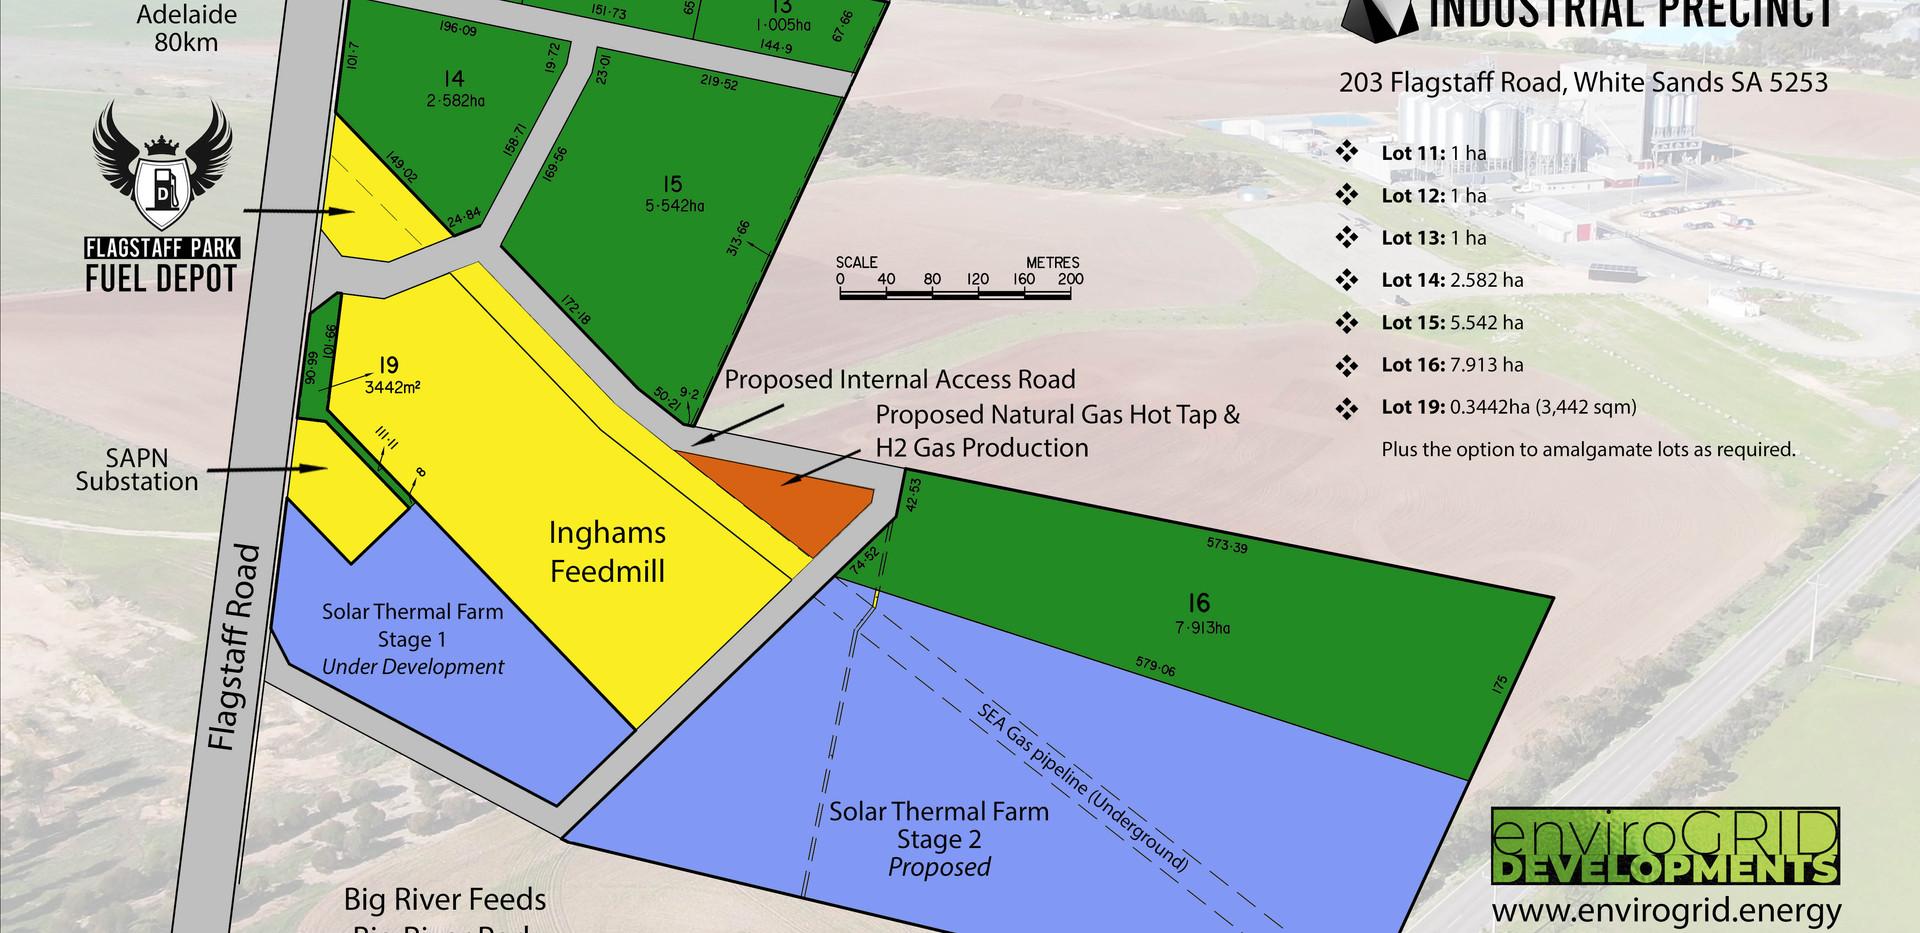 Flagstaff Park Industrial Precinct Masterplan 2021